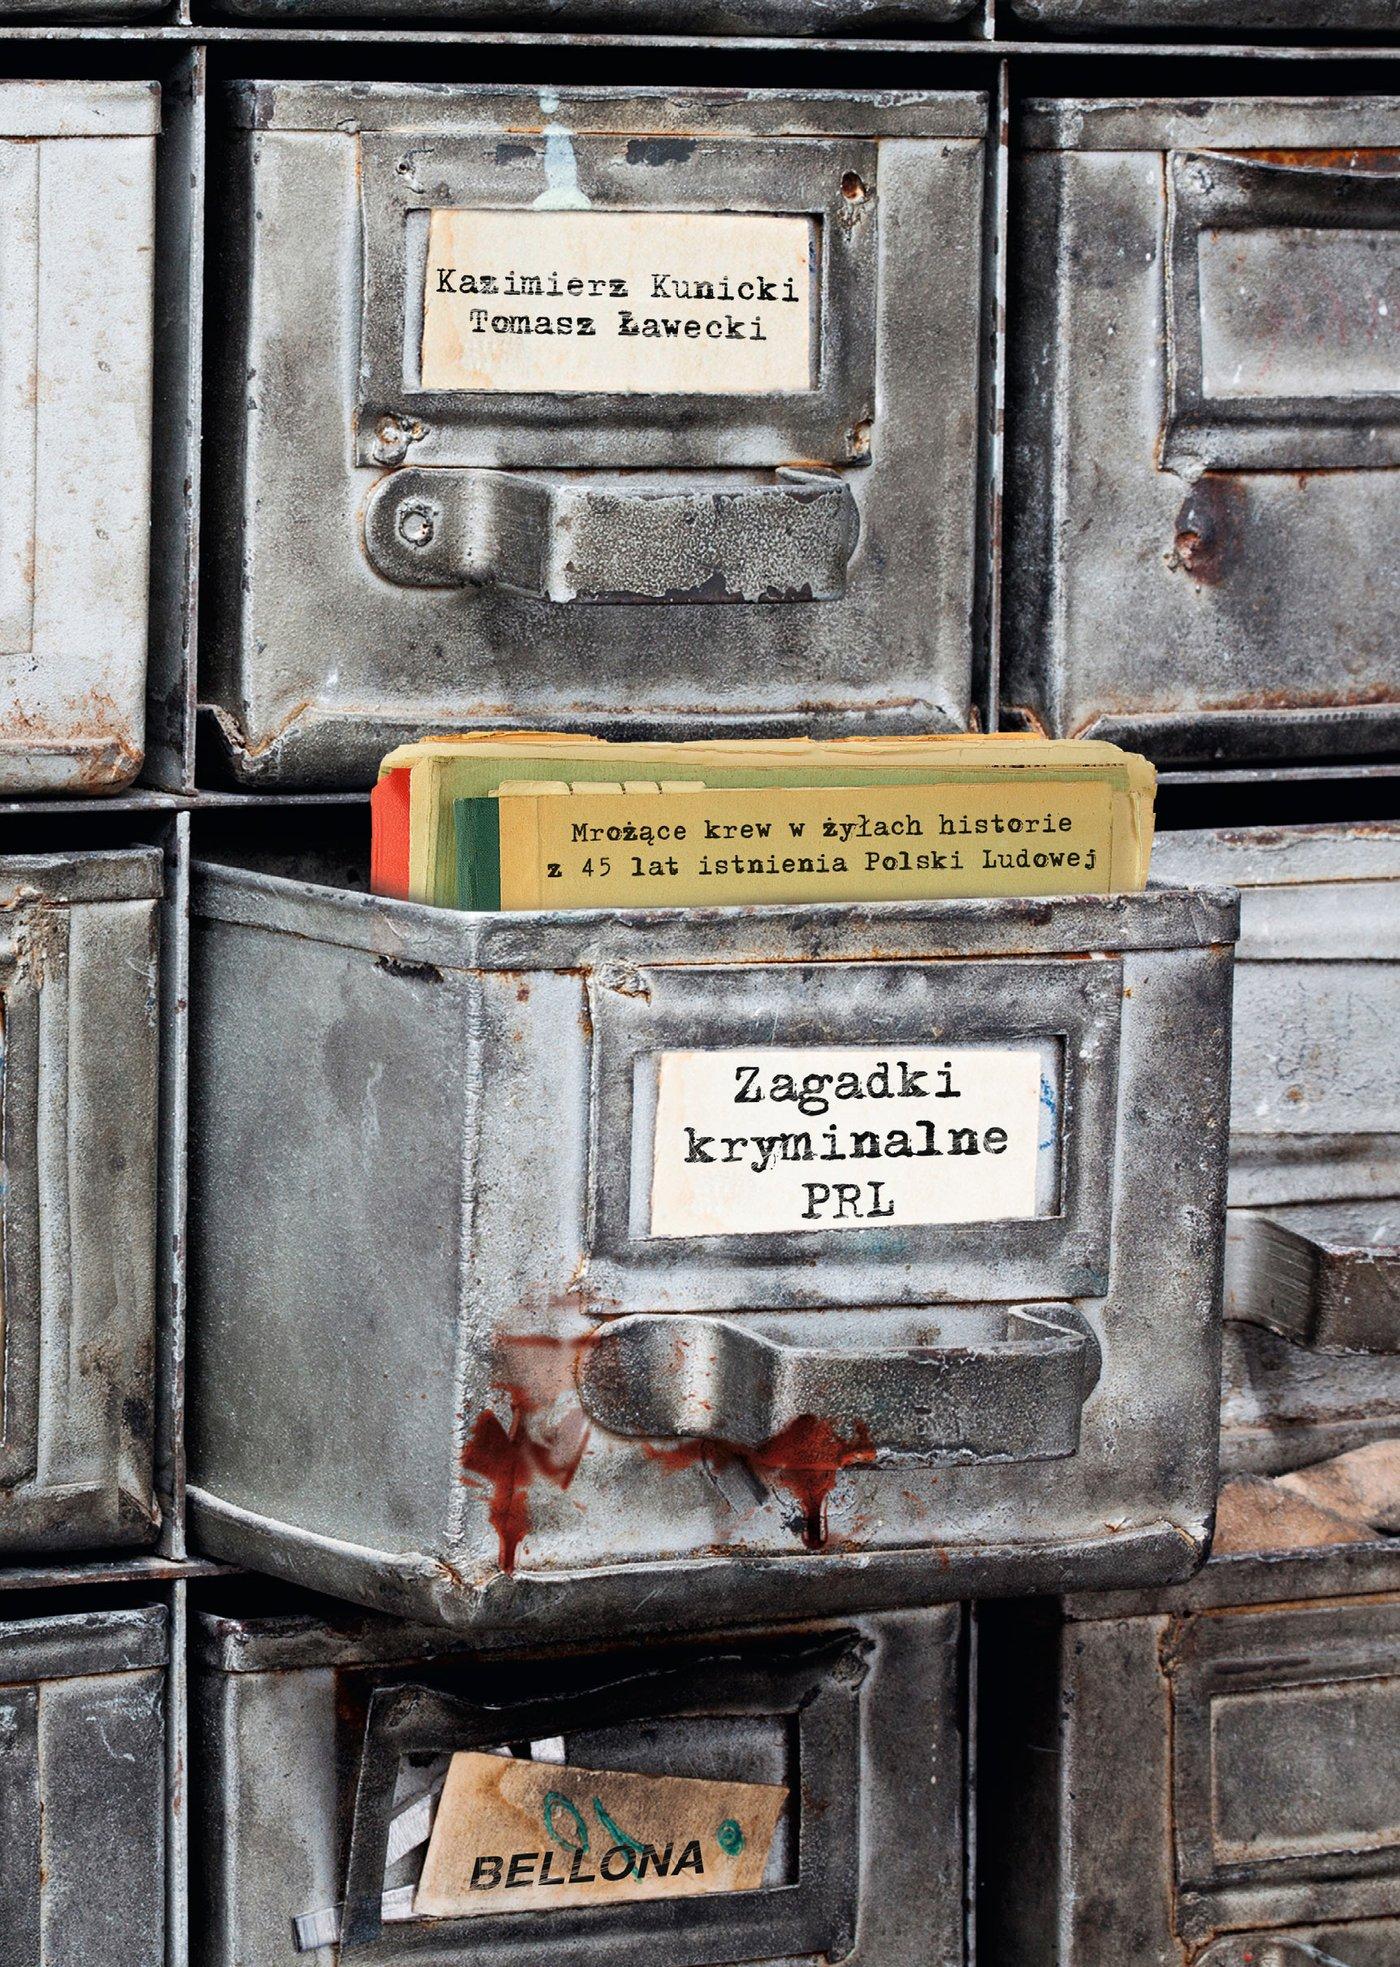 Zagadki kryminalne PRL - Ebook (Książka na Kindle) do pobrania w formacie MOBI